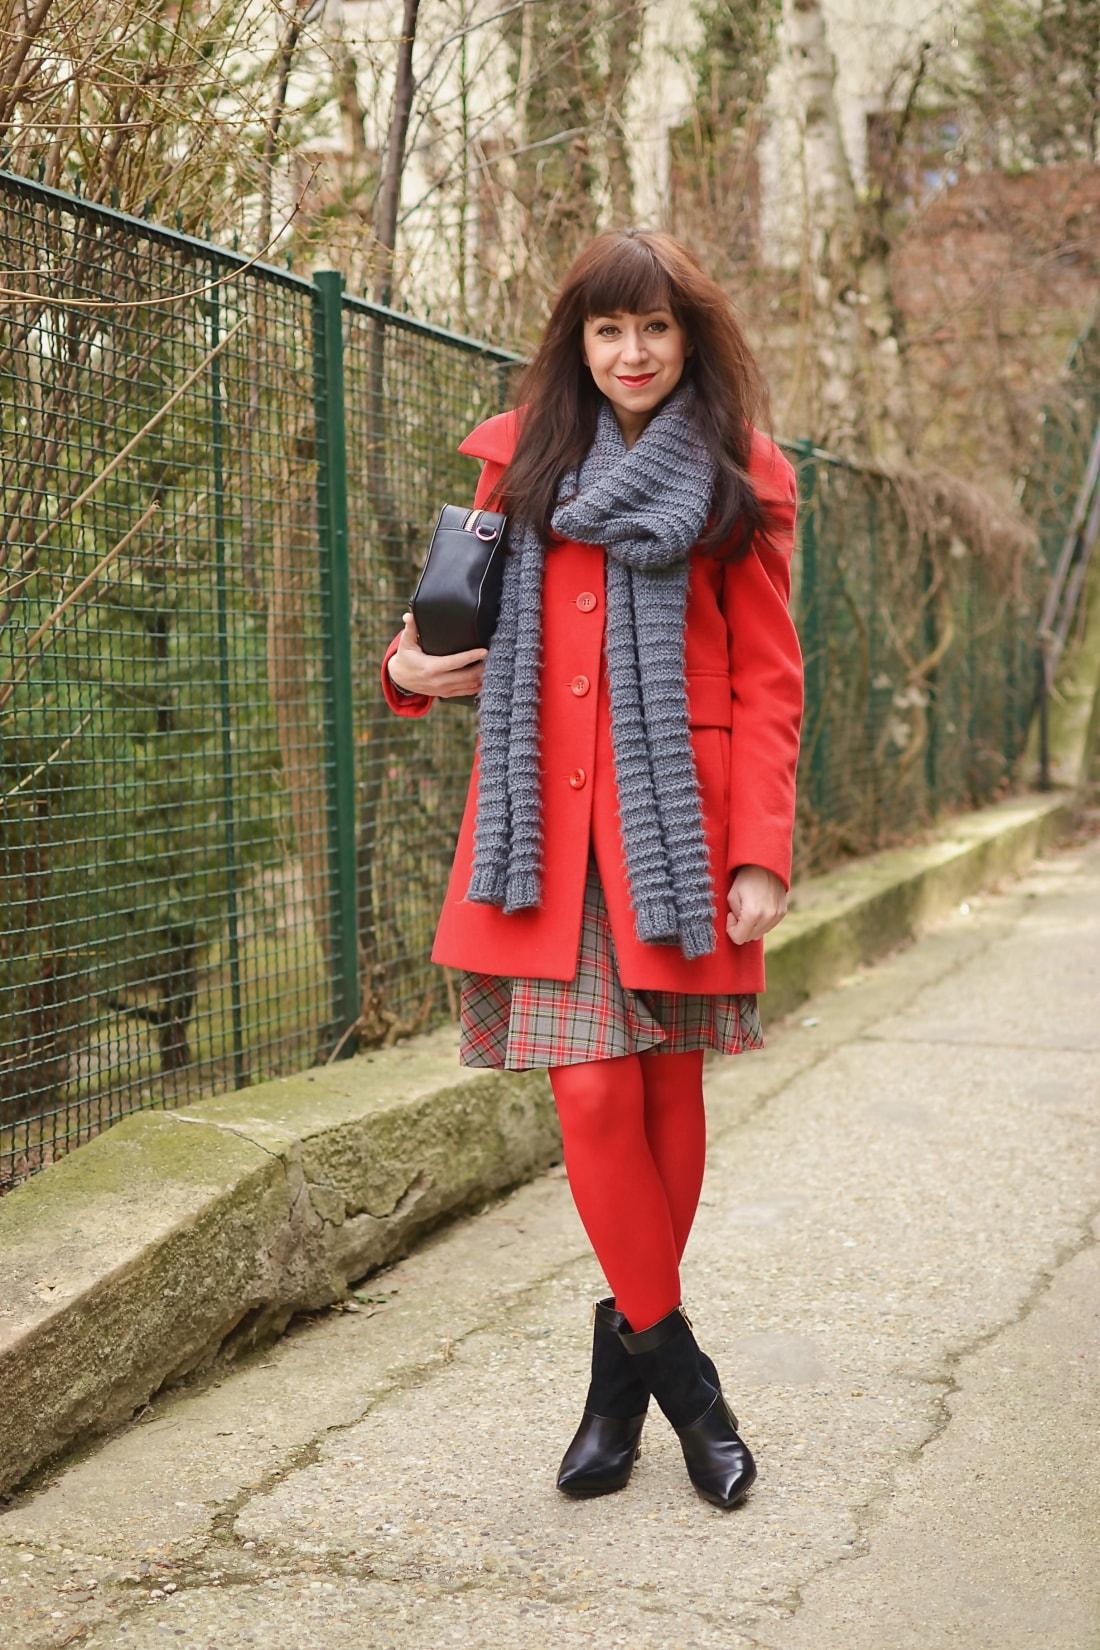 Červená_Katharine-fashion is beautiful_blog 6_Červené pančuchy_Červený kabát_Károvaná sukňa_Katarína Jakubčová_Fashion blogger_Outfit